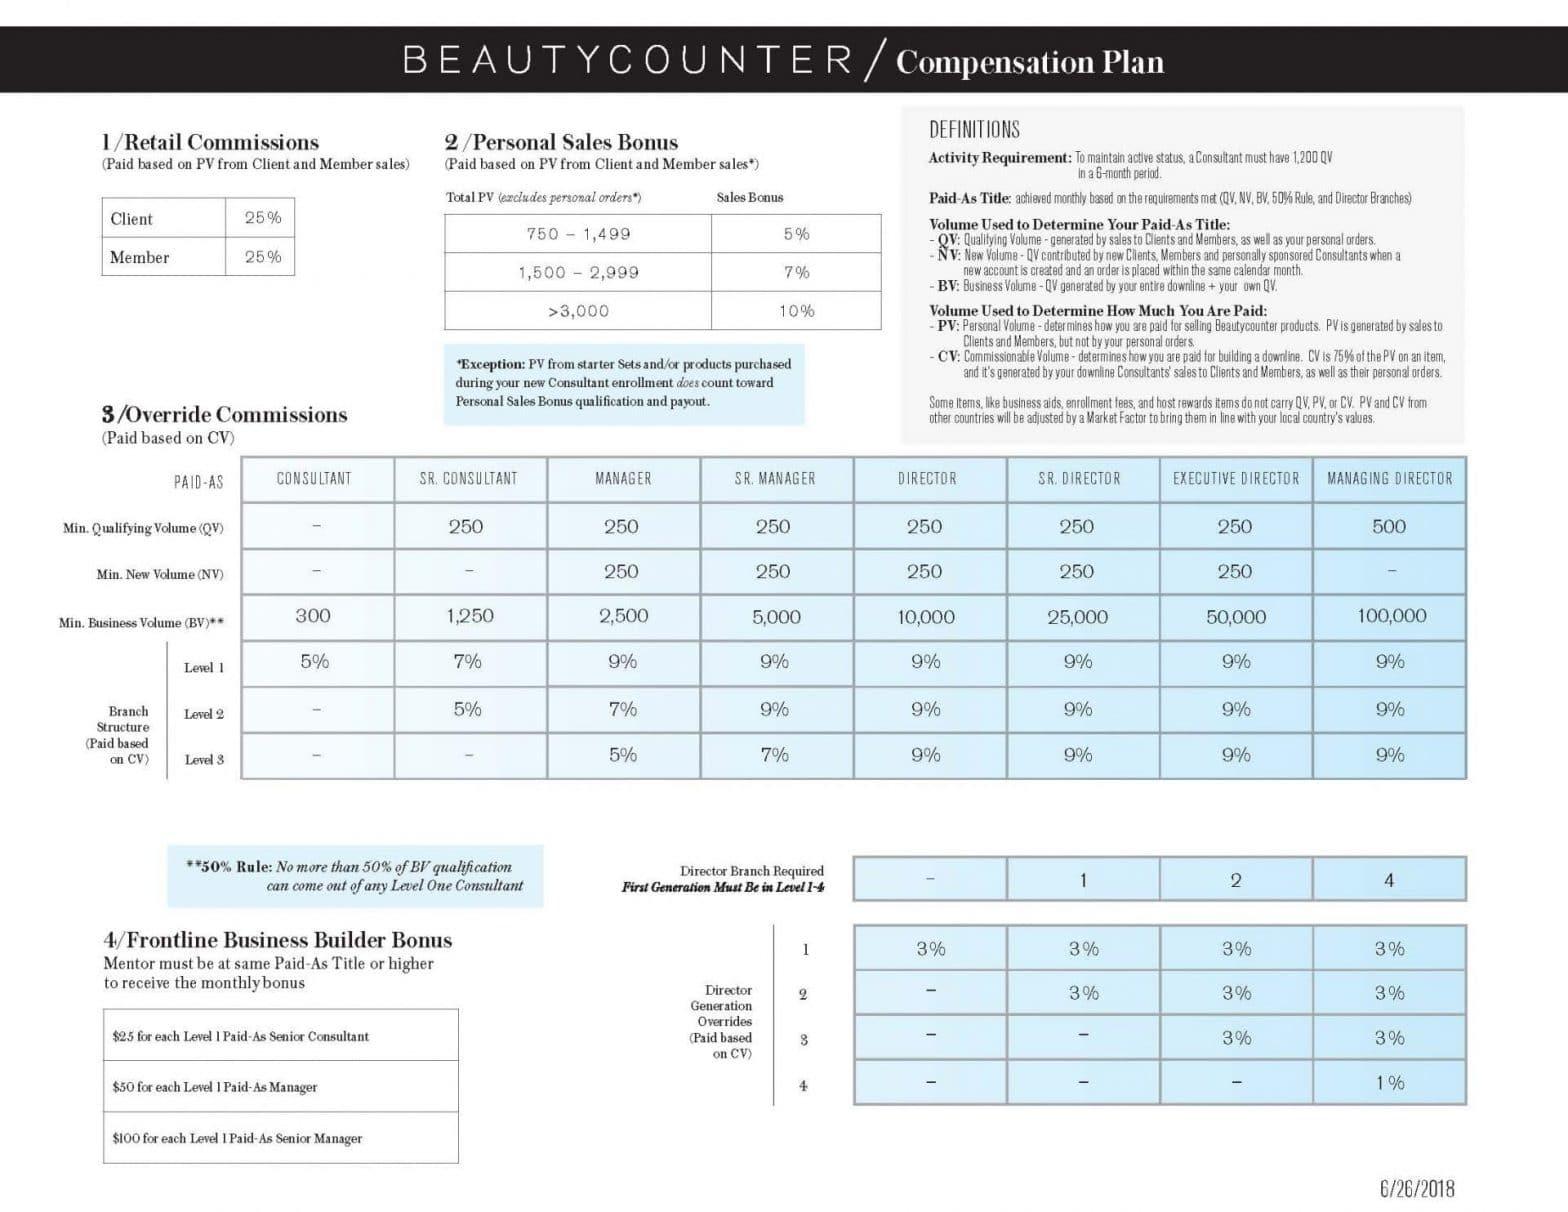 Beautycounter Compensation Plan